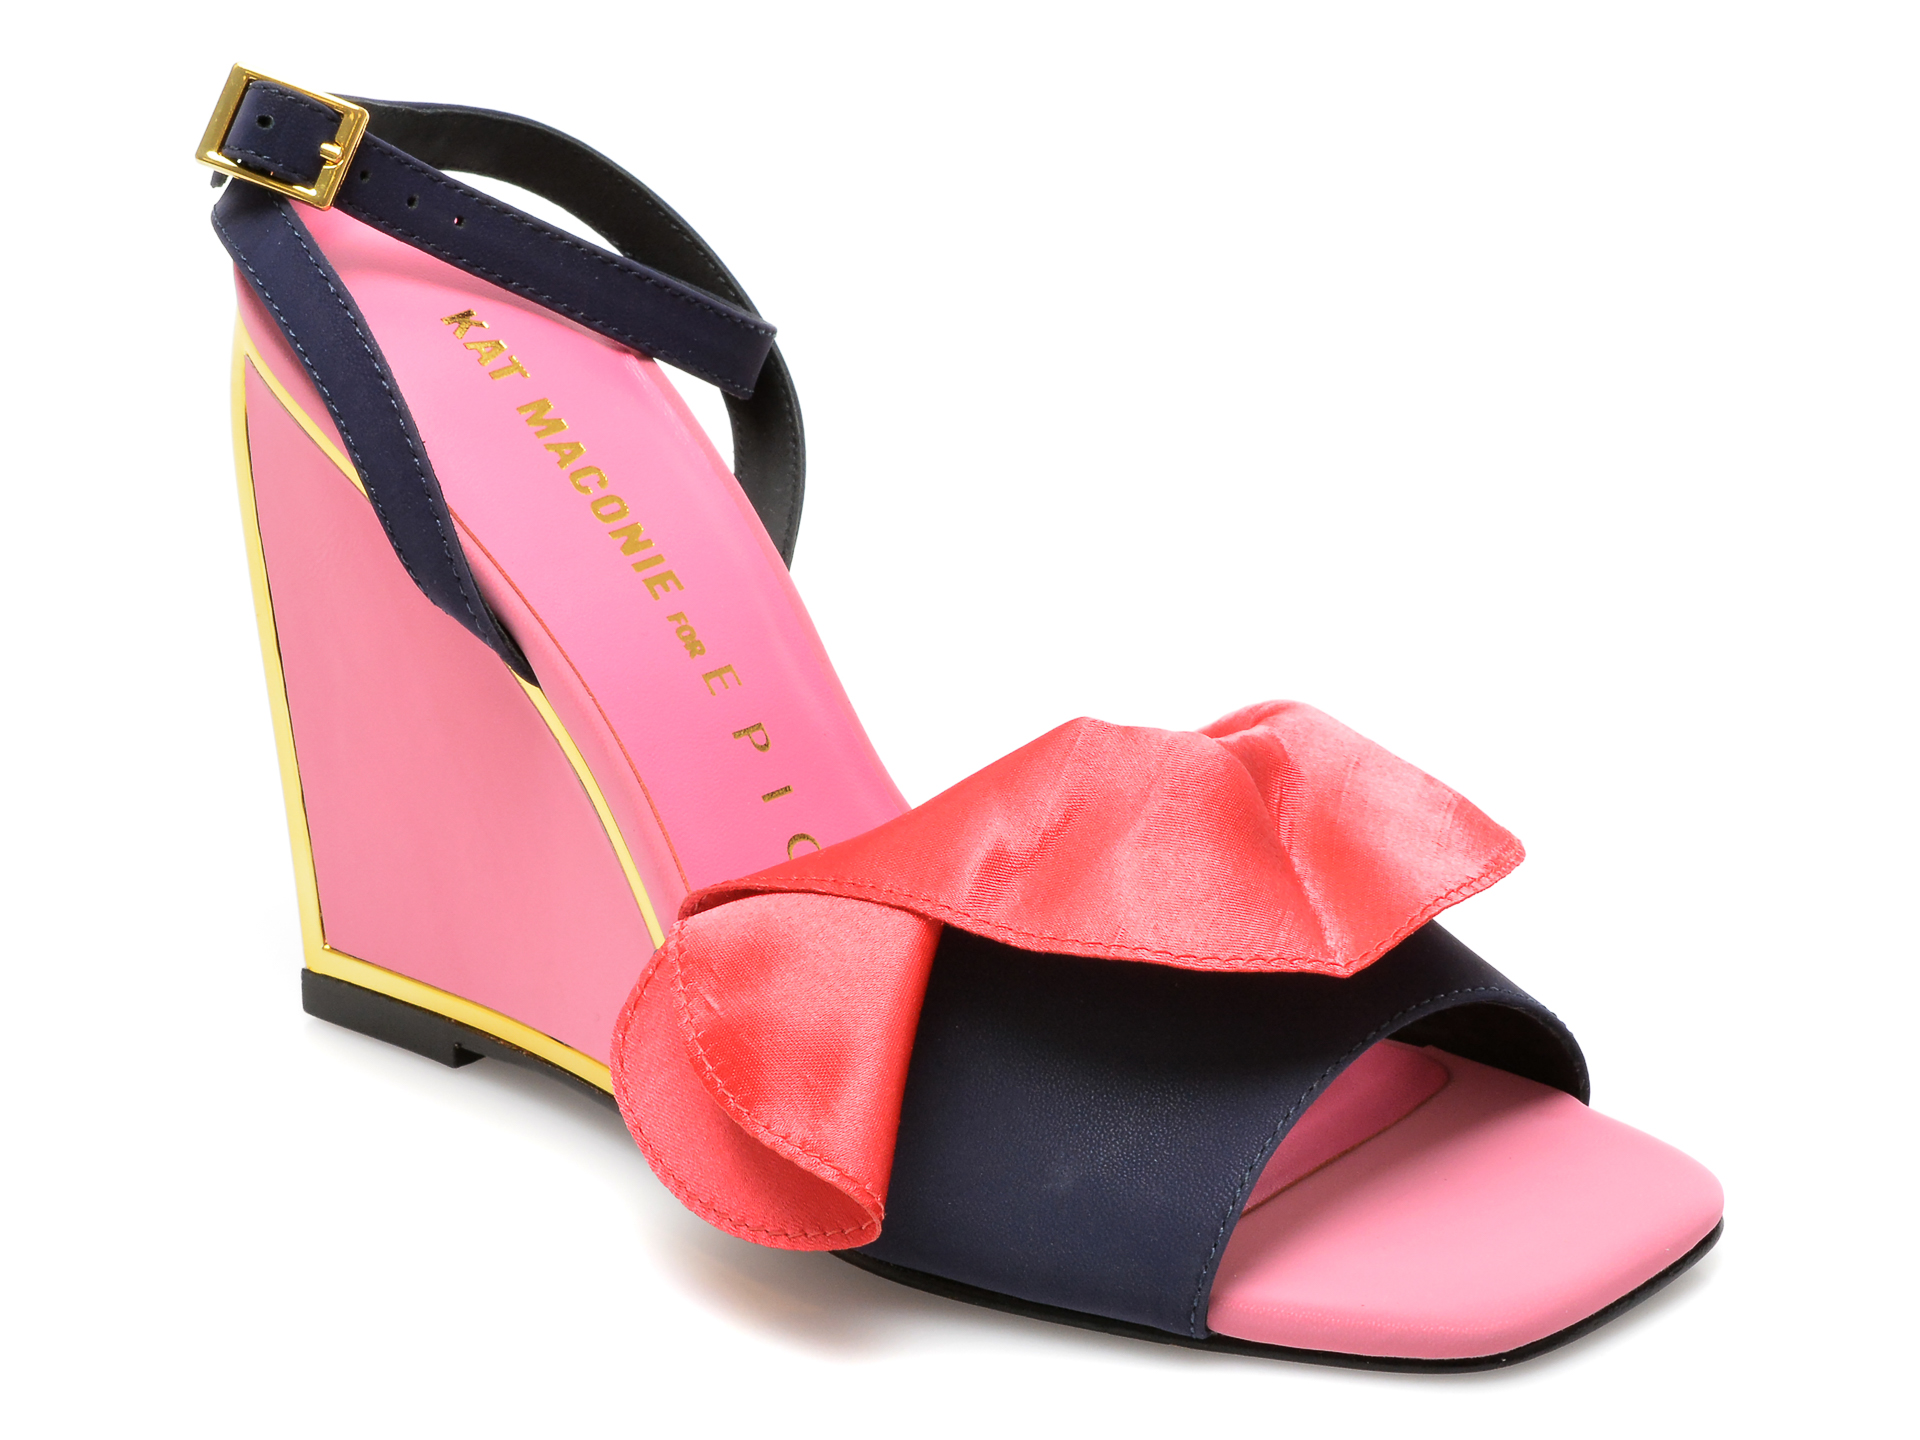 Sandale KAT MACONIE roz, RUBY, din piele naturala